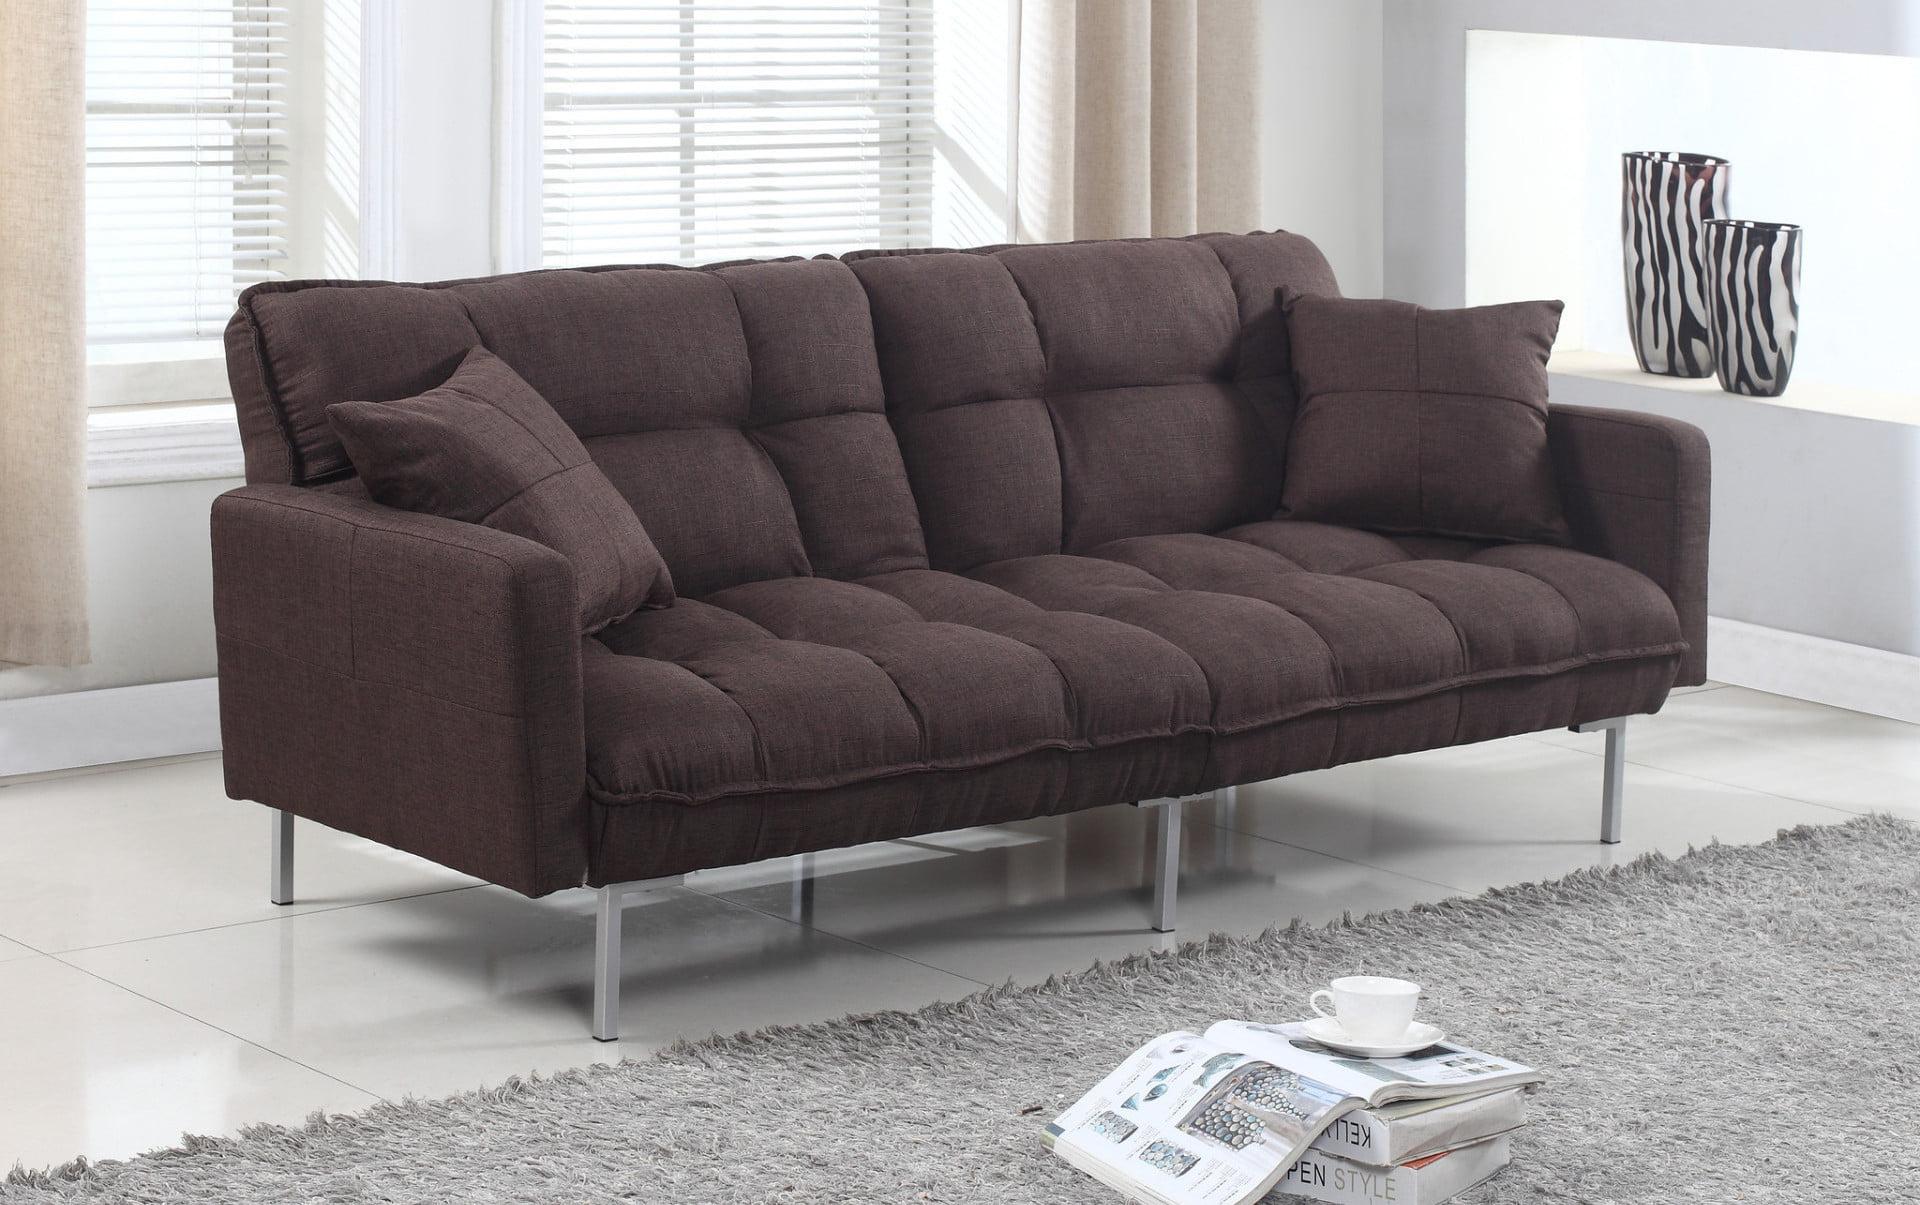 futon modern simple modern futon sofa bed grey boca futon the  - modern plush tufted linen fabric splitback living room sleeper